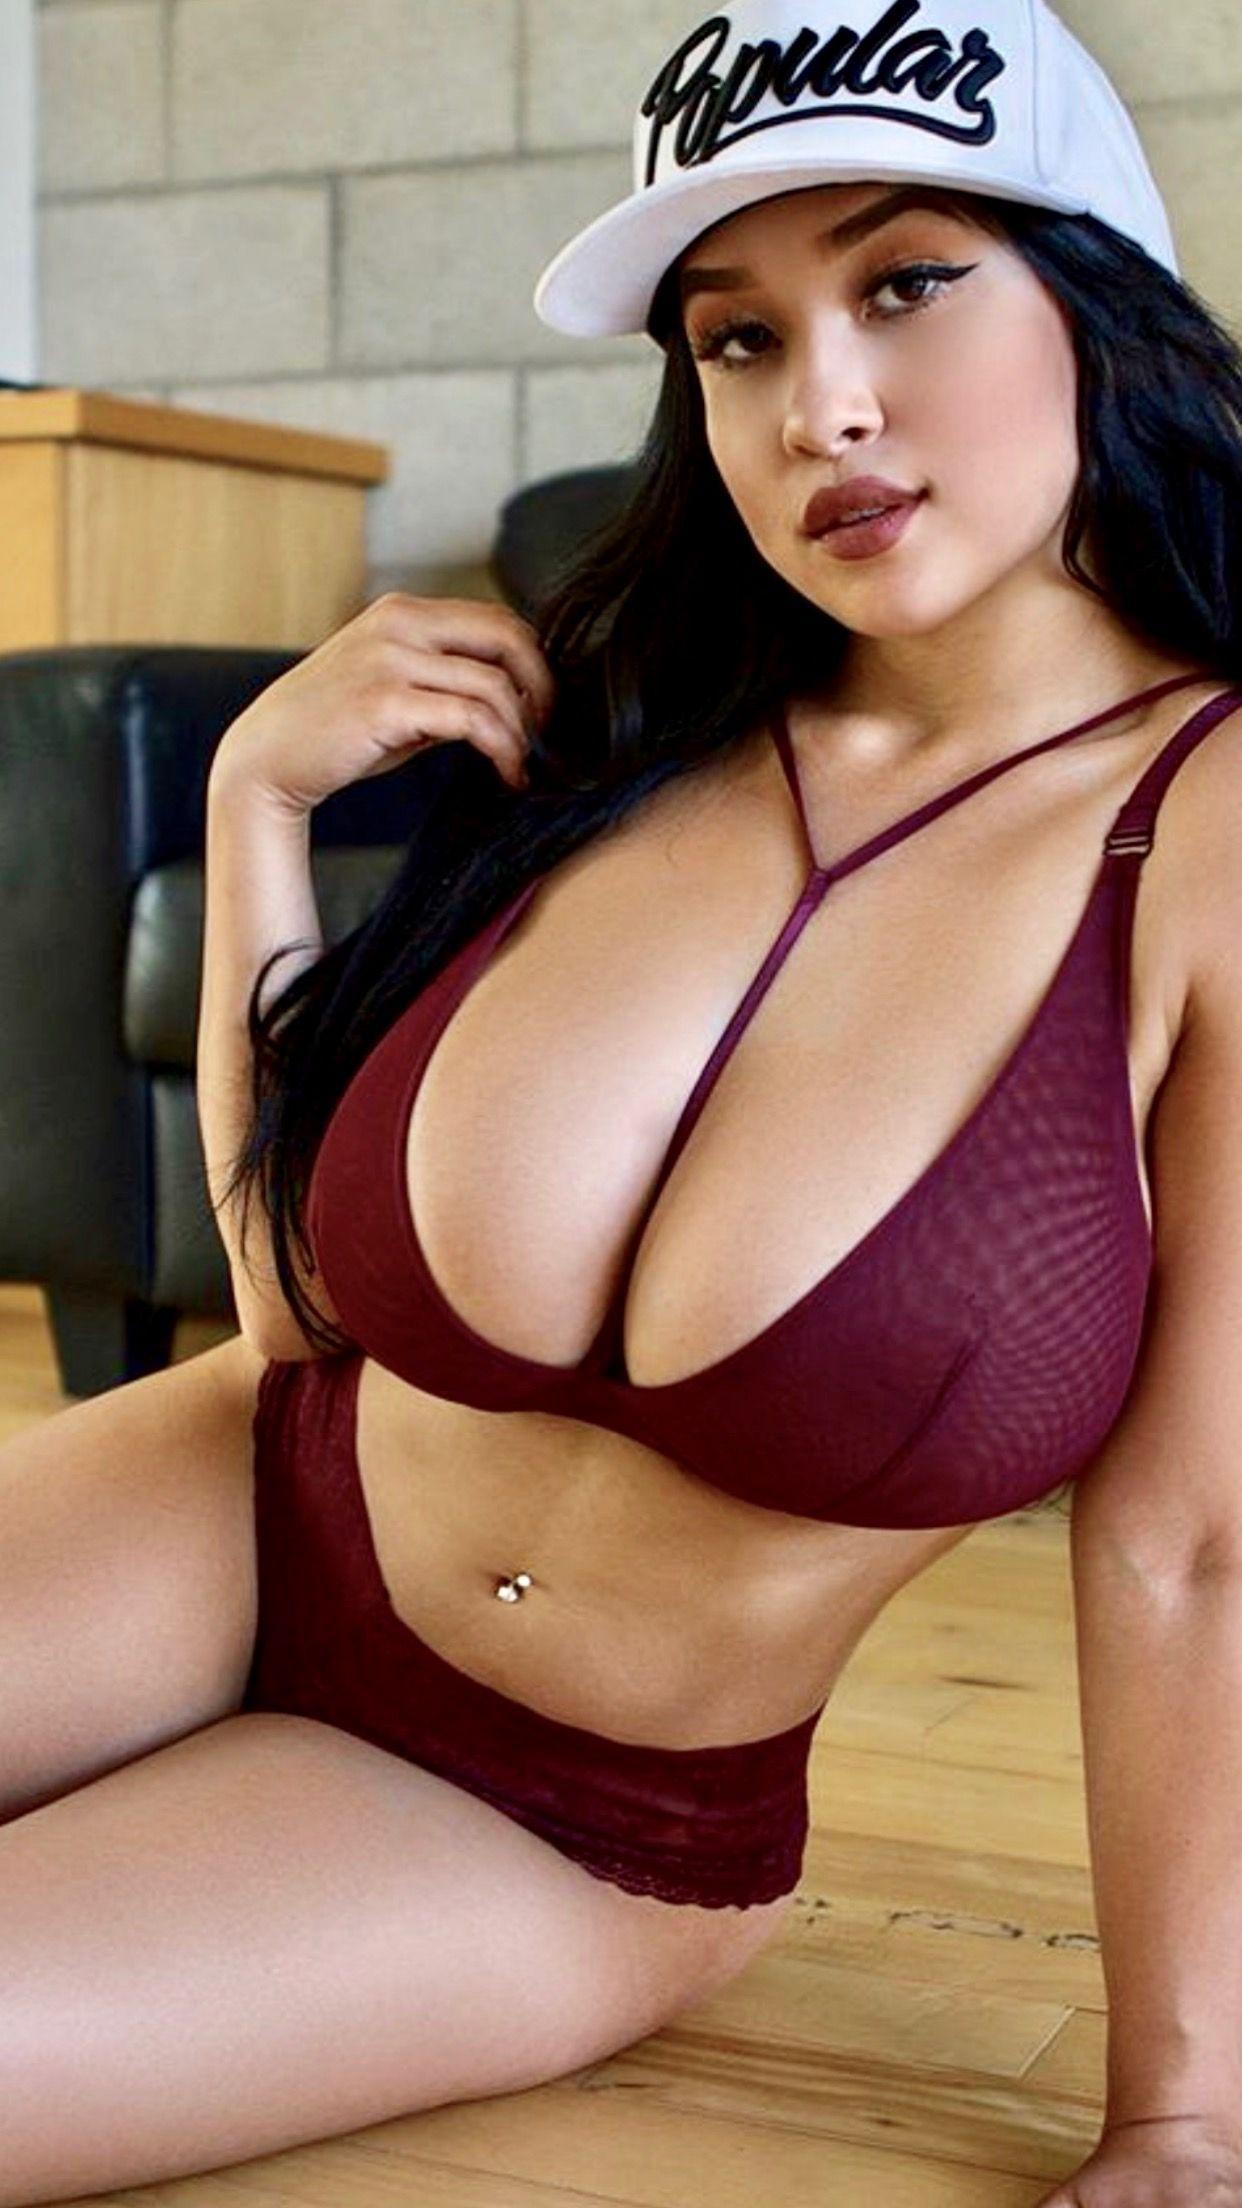 Phoebe price bikini